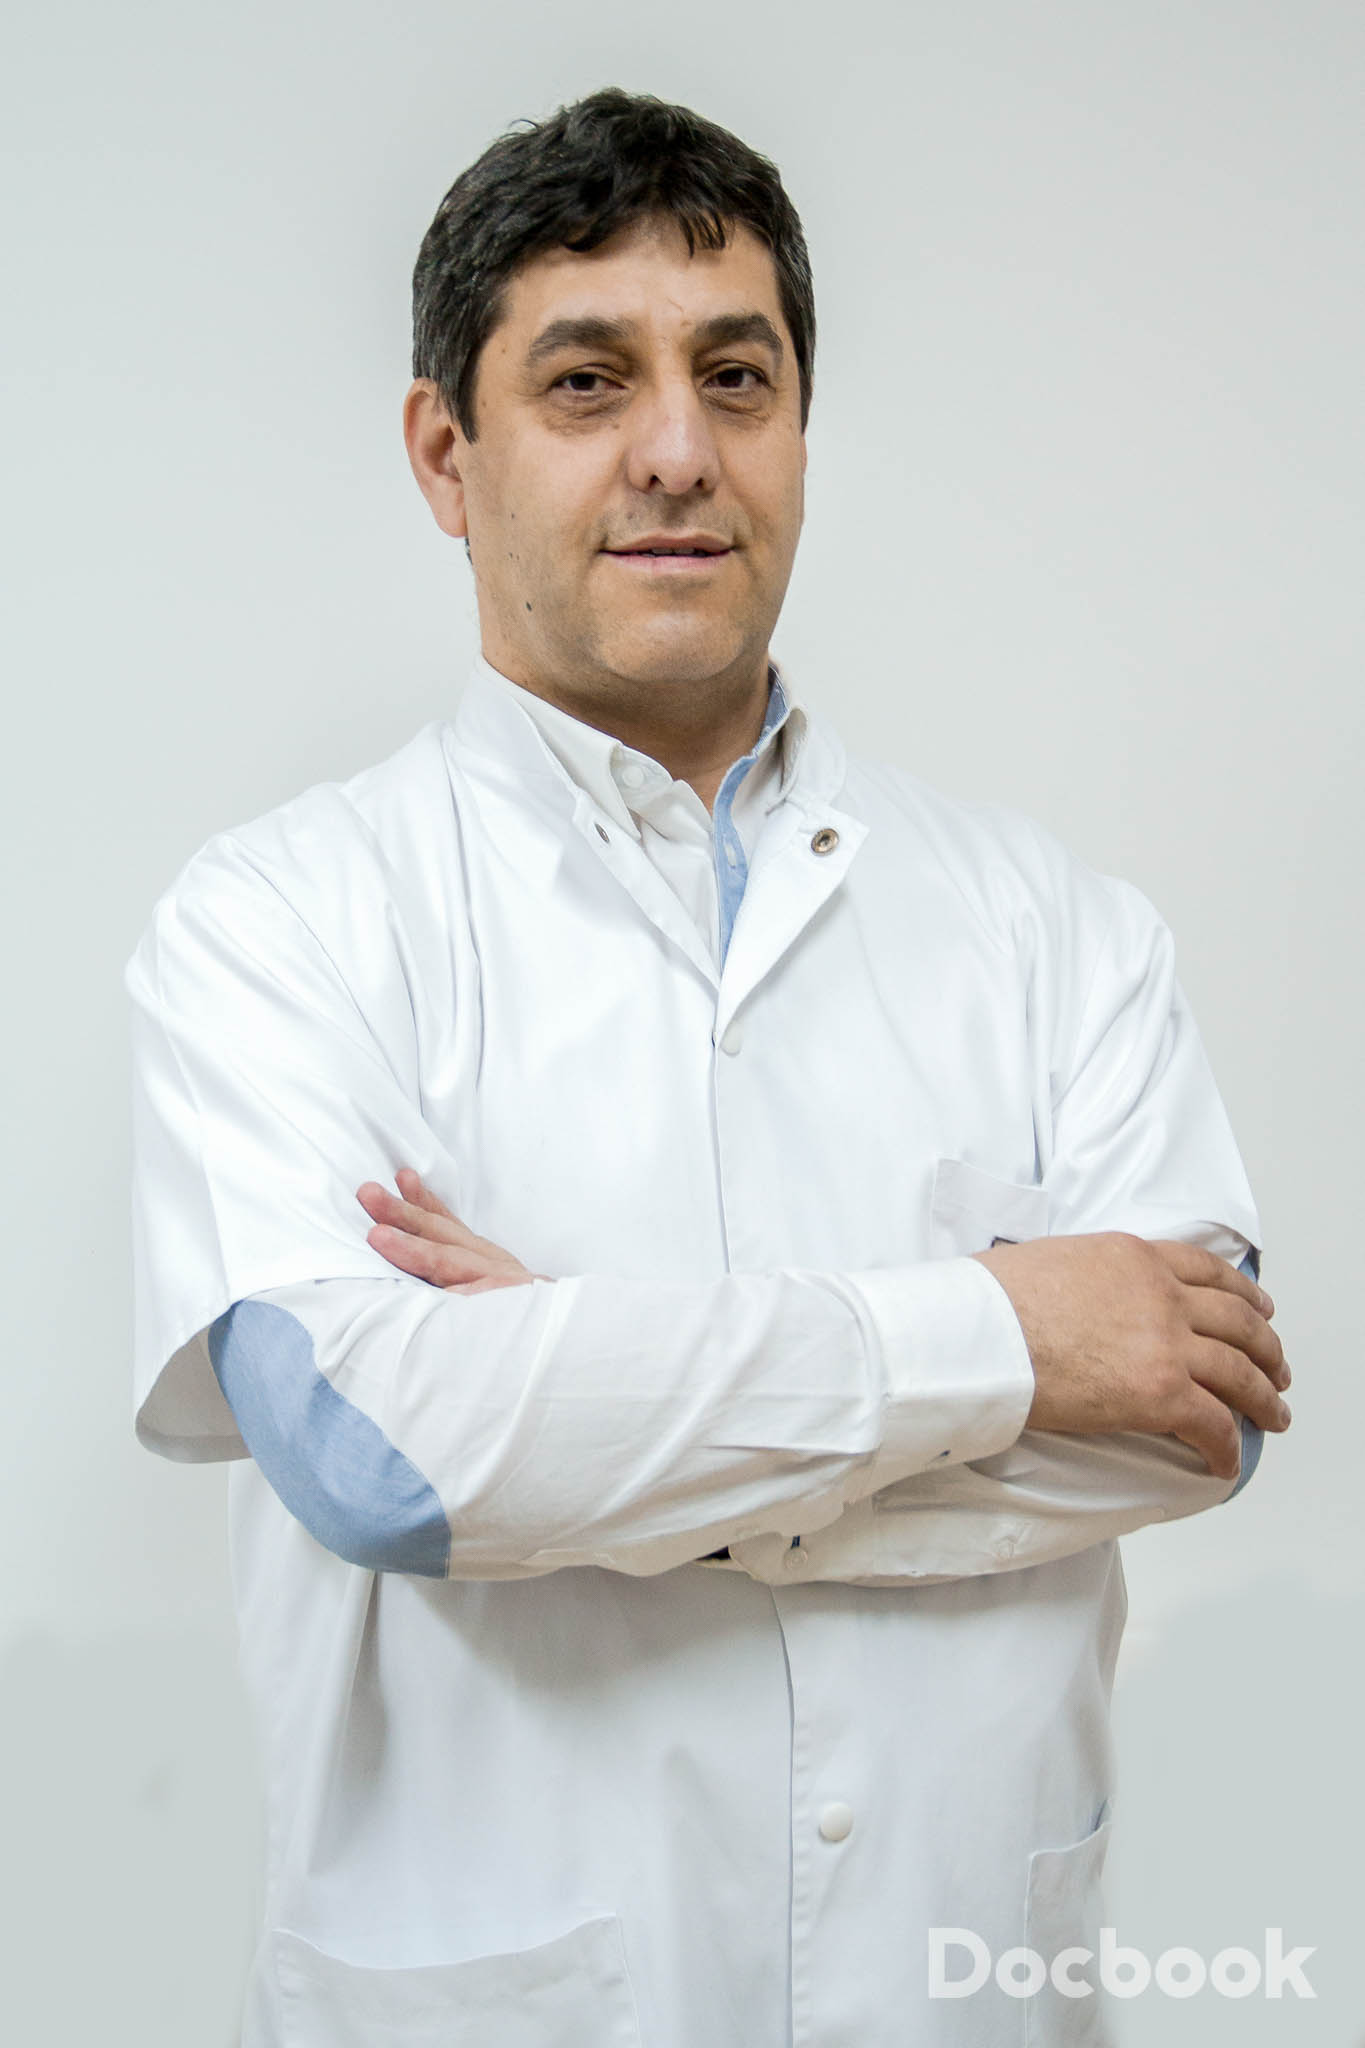 Dr. Horia Bumbea